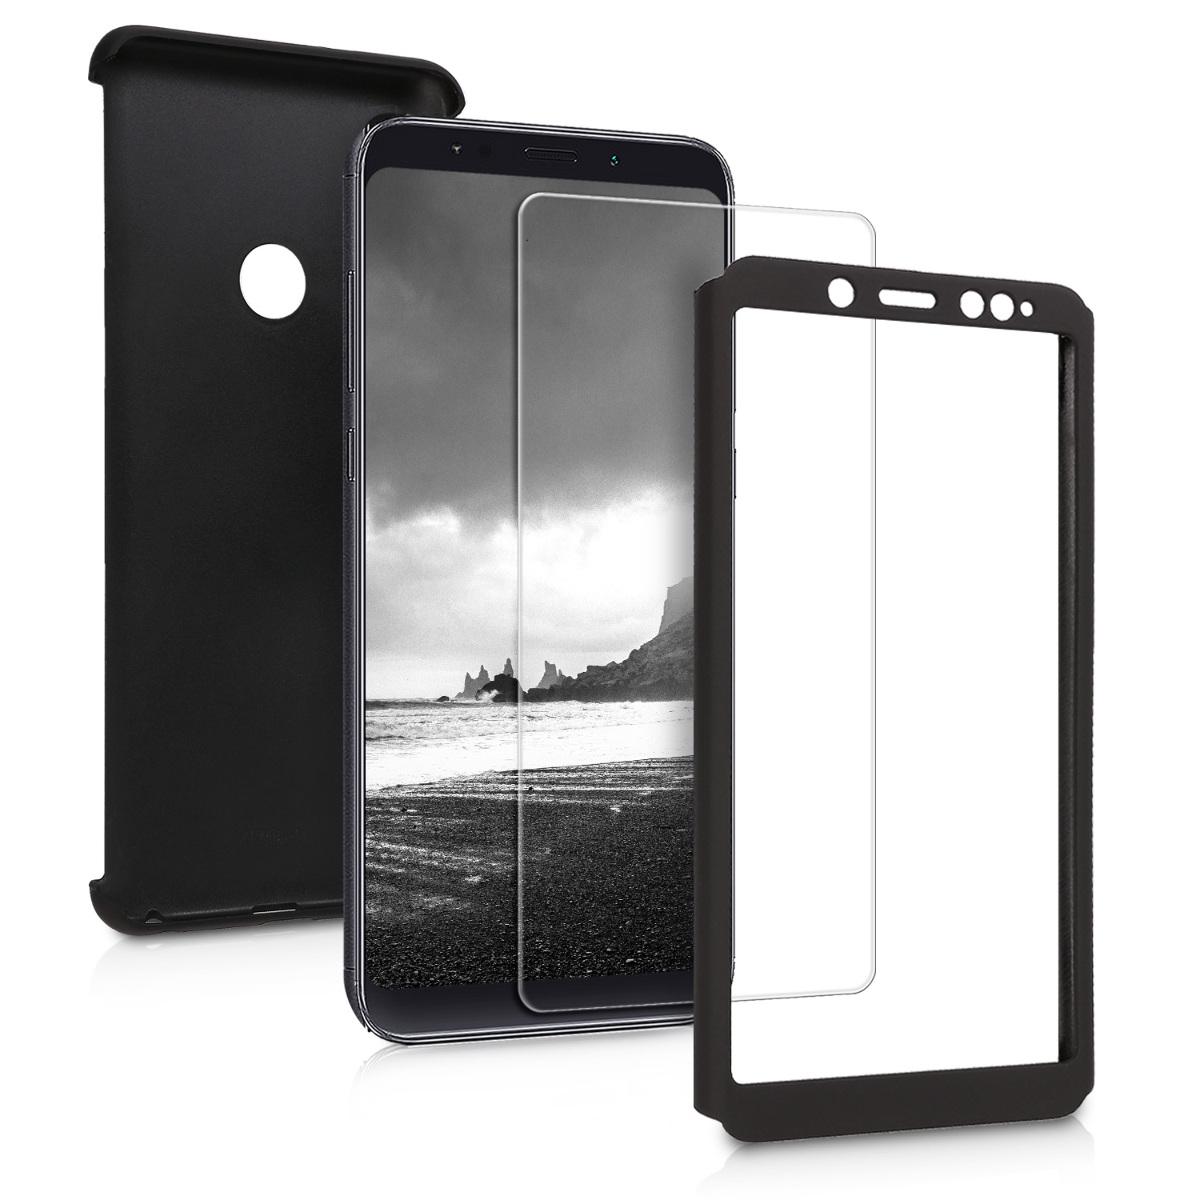 KW Θήκη Full Body για Xiaomi Redmi Note 5 & Tempered Glass - Metallic Black  (45468.68)